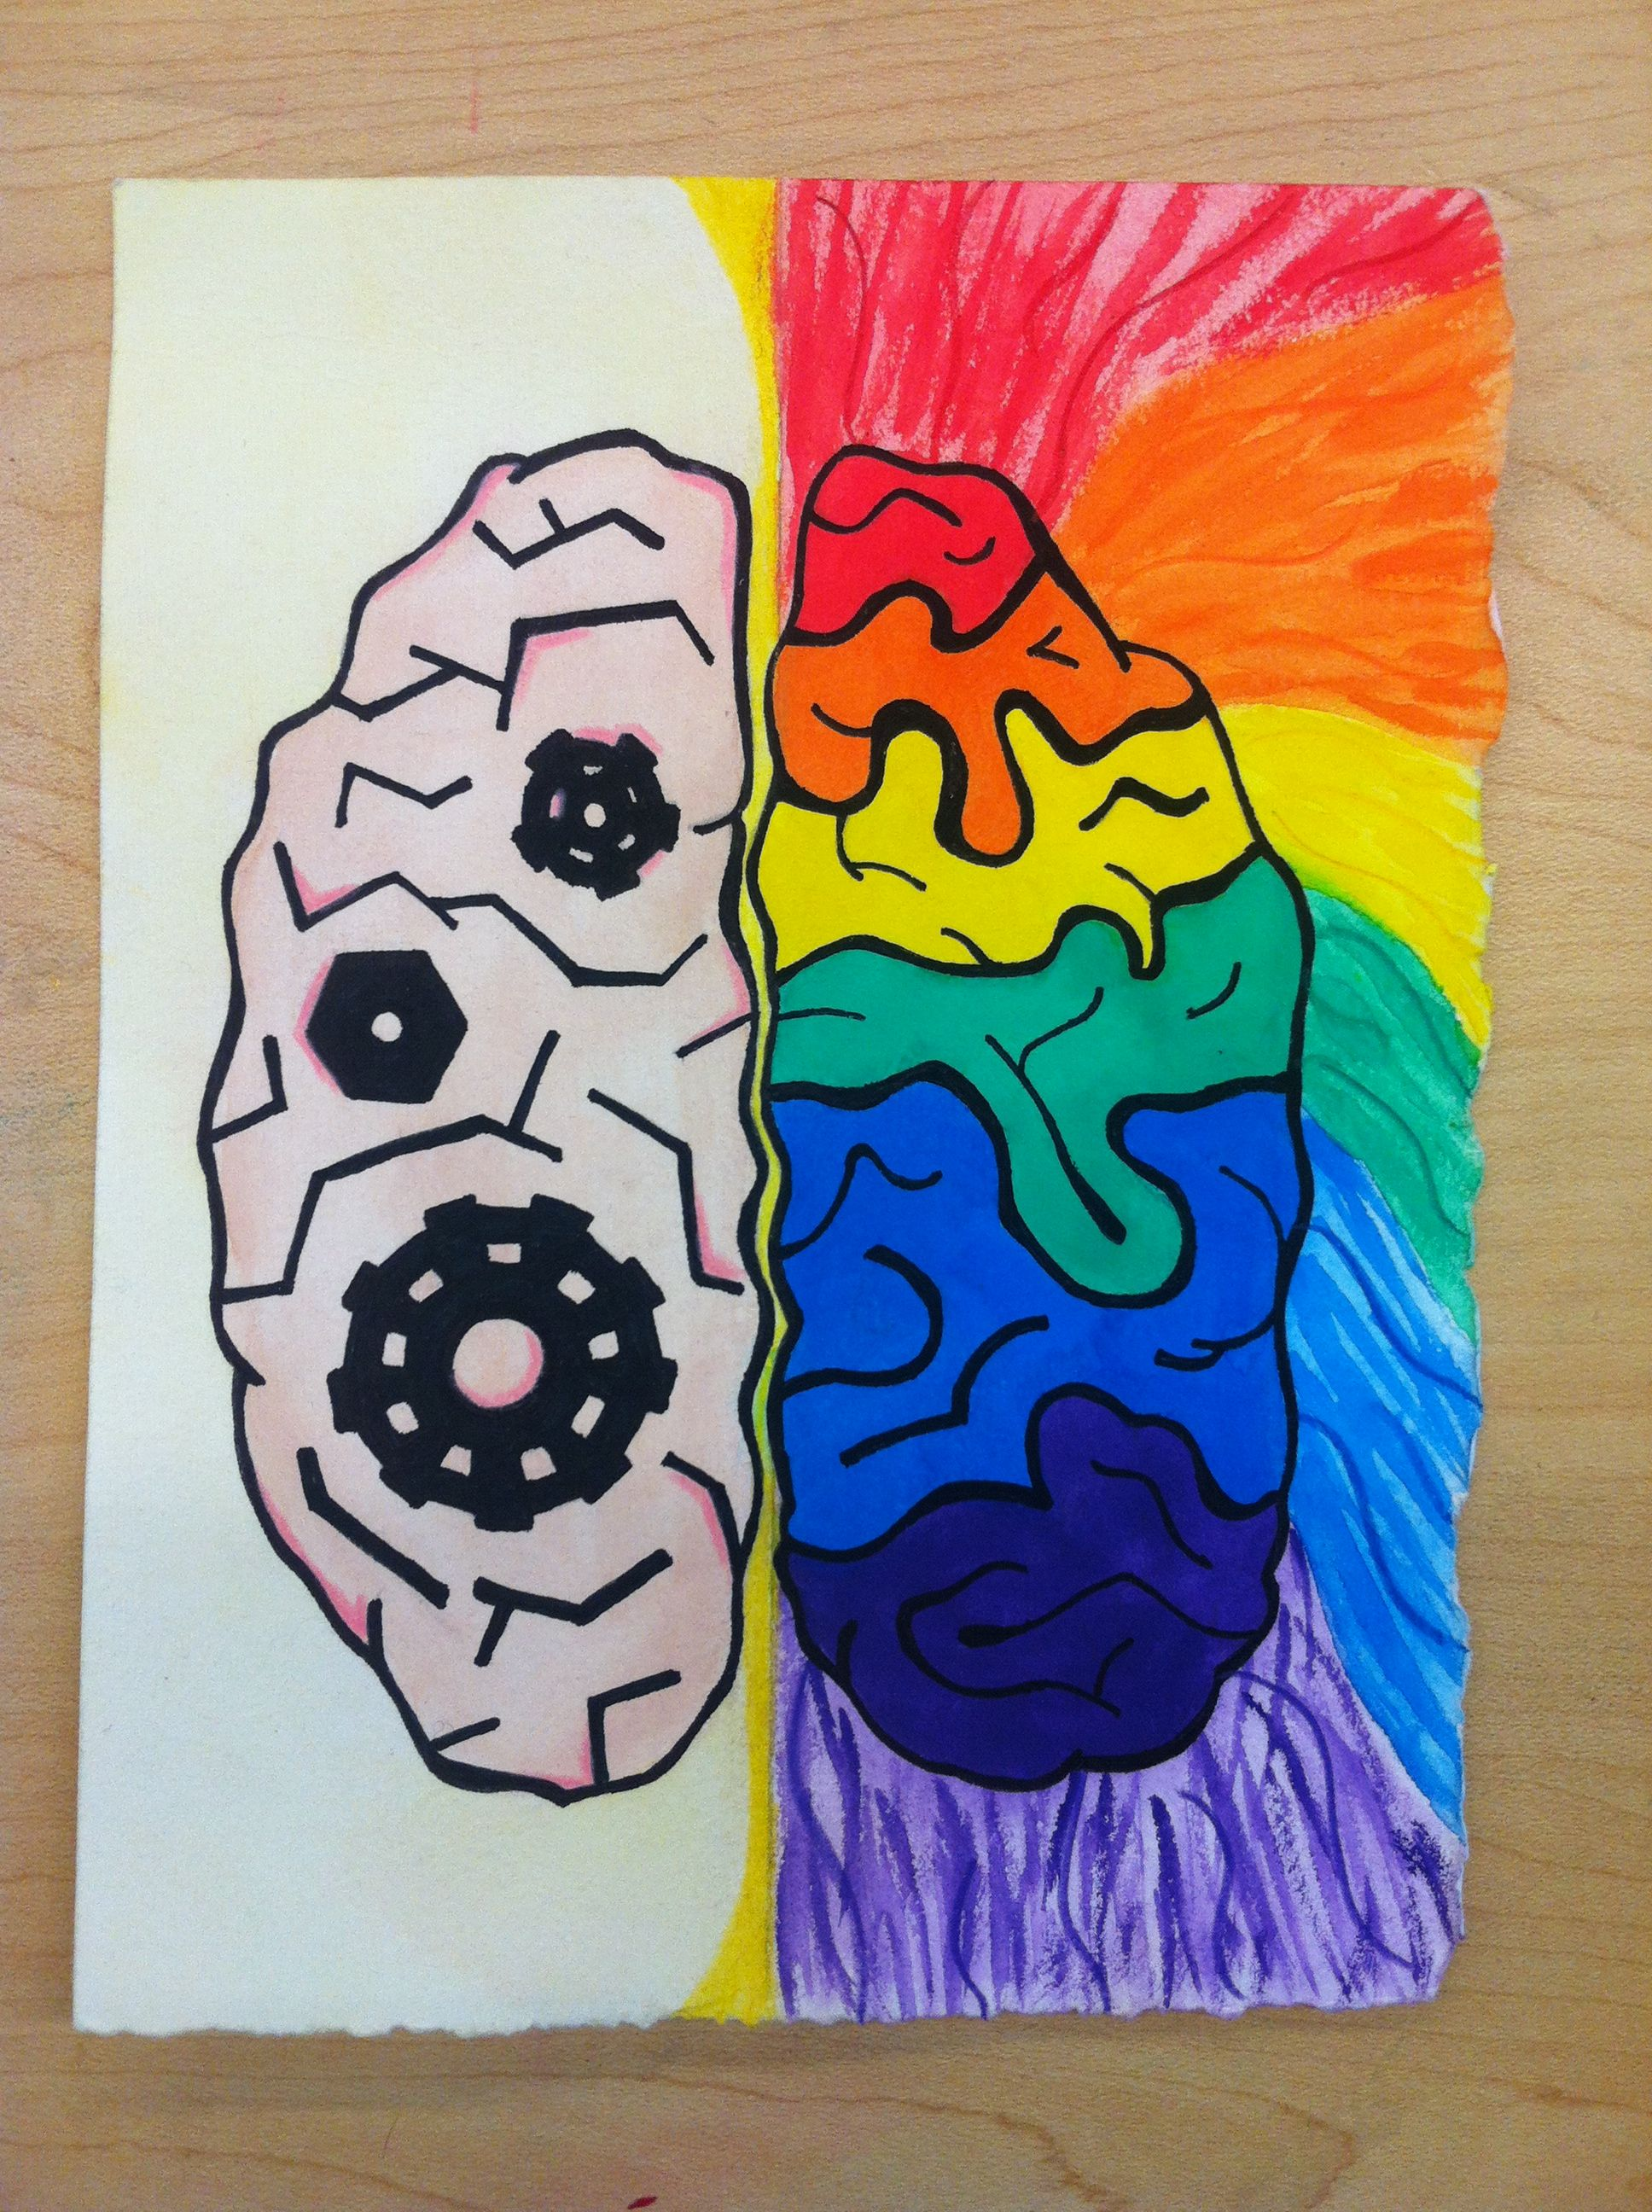 Anatomy Project: left brain vs right brain | Right Brain | Pinterest ...